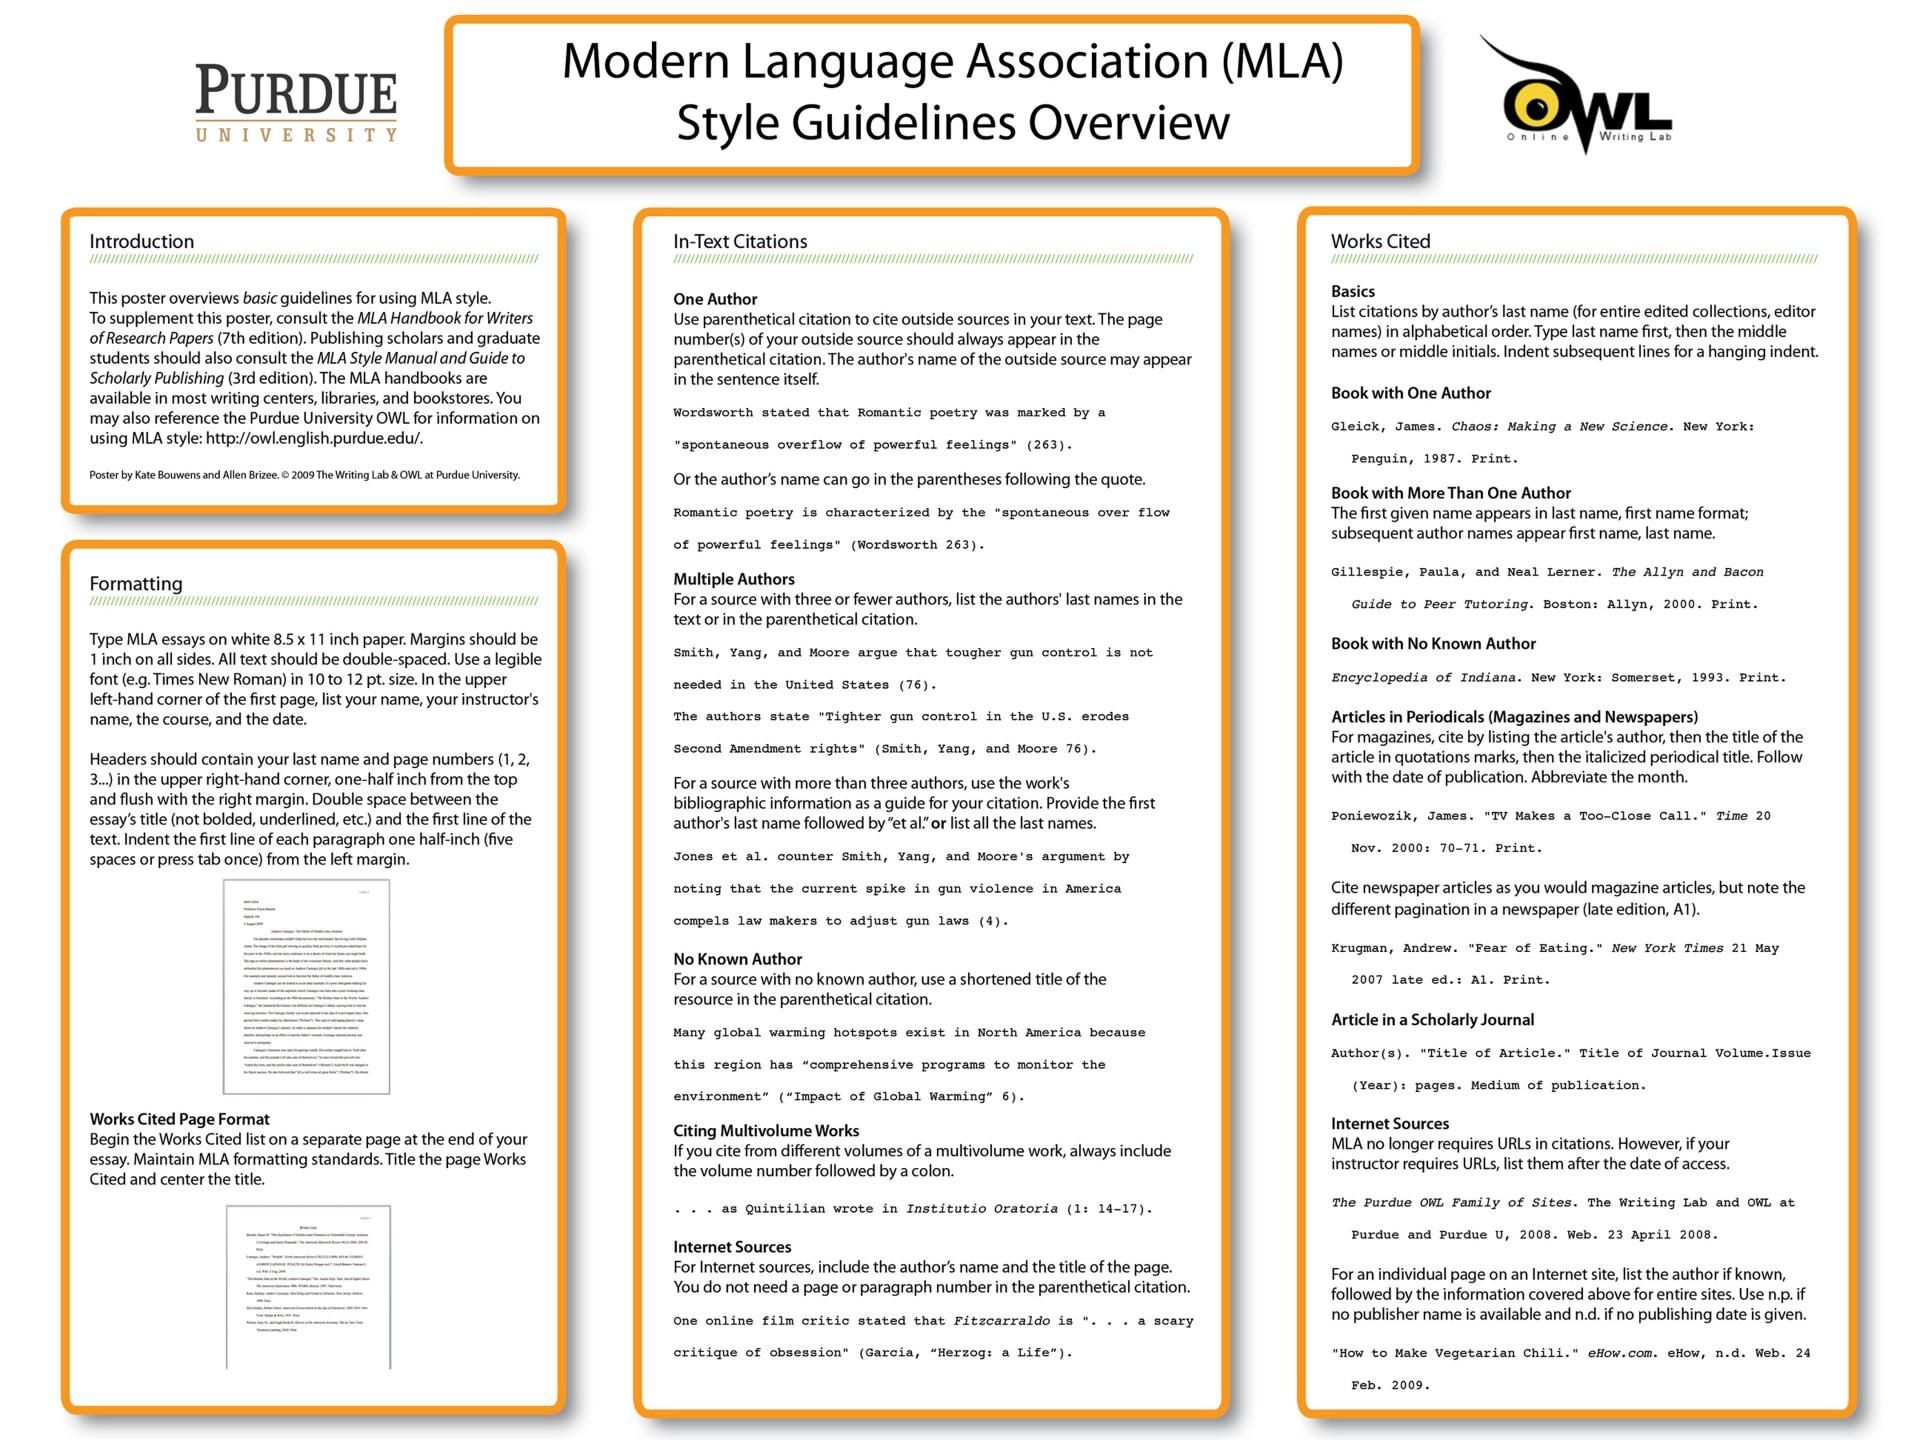 010 Mlasheet Mla Format Essay Citation Unbelievable Cite Example In Text Website No Author 1920